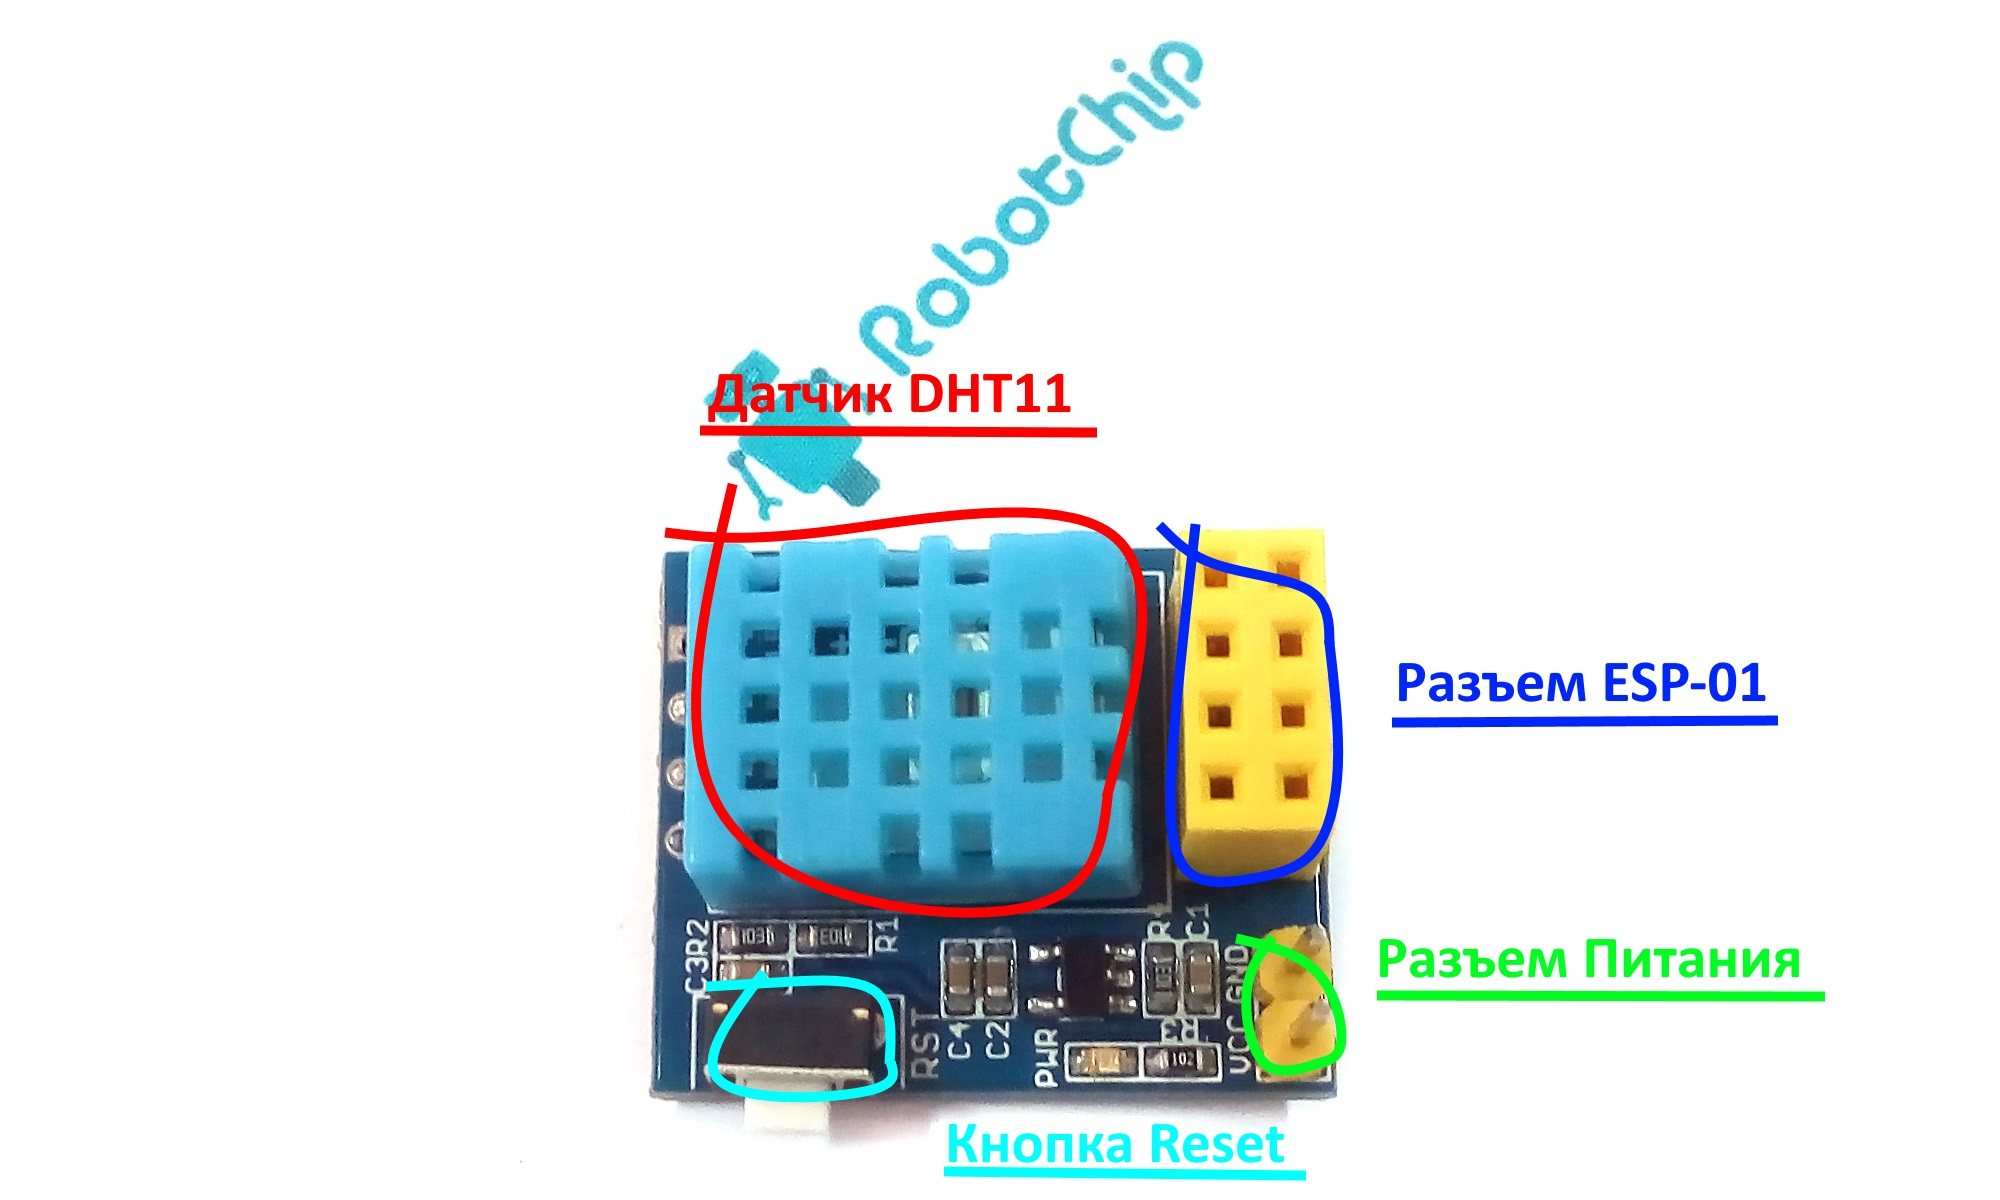 Обзор модуля DHT11 для ESP-01